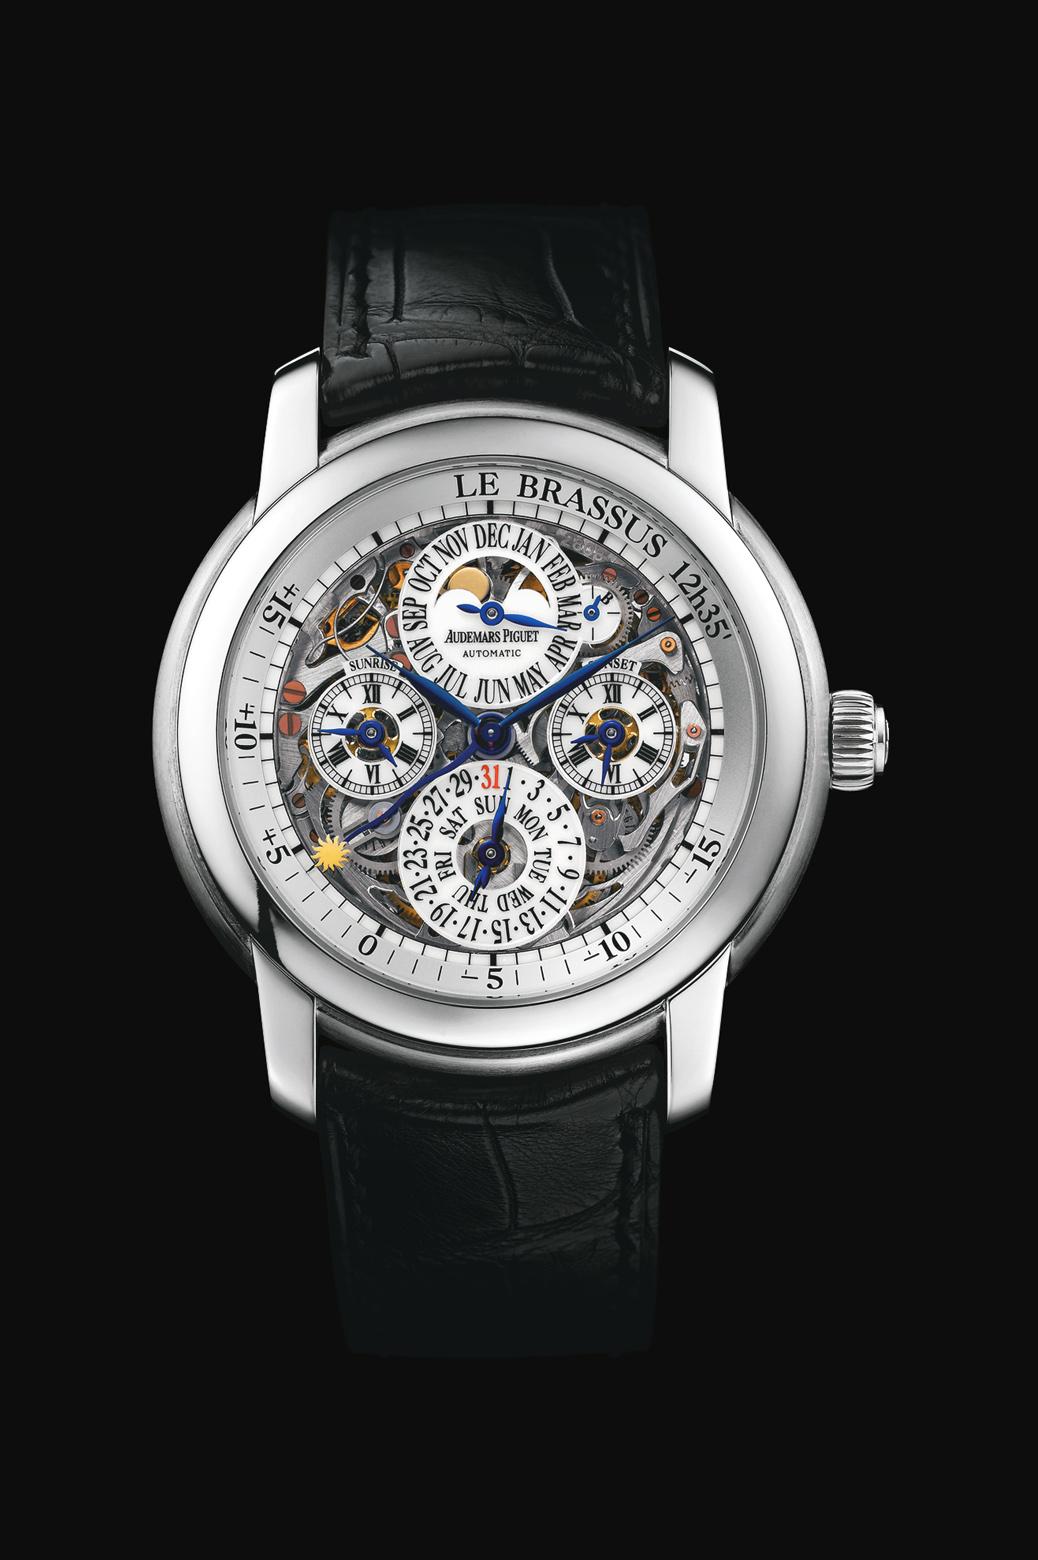 часы Audemars Piguet Jules Audemars Equation du Temps Squelette